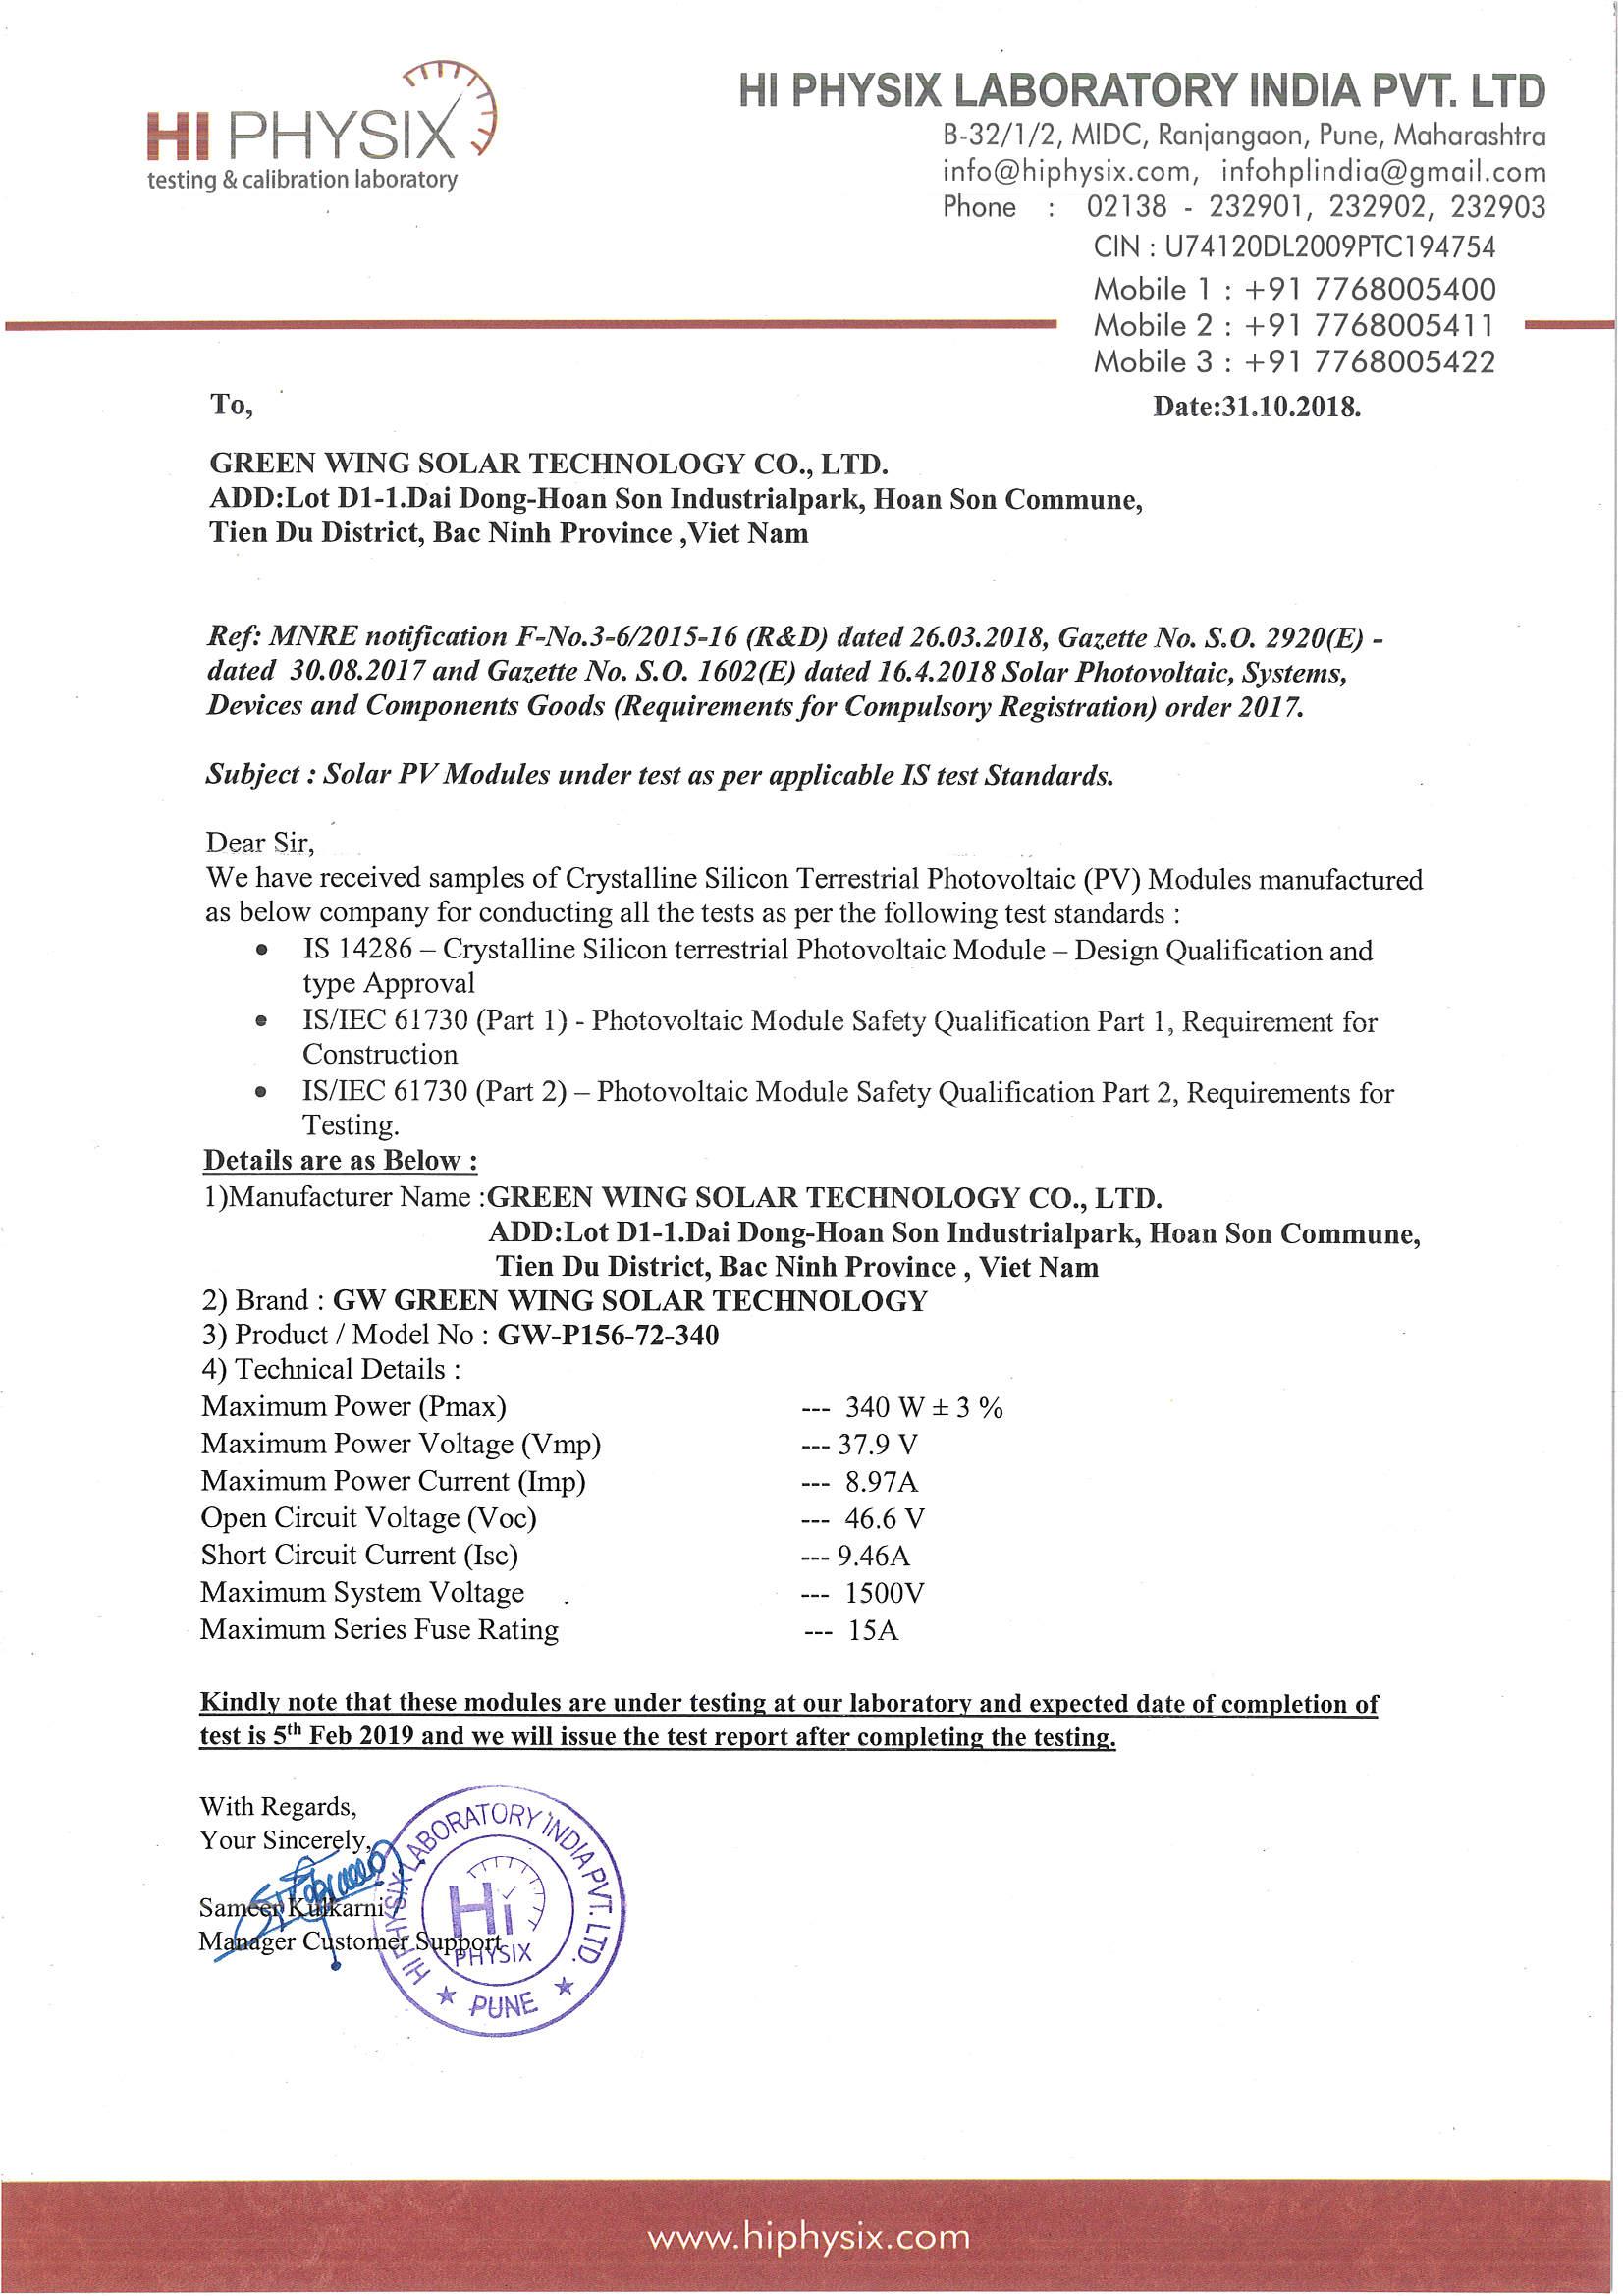 GW declaration certificate BIS